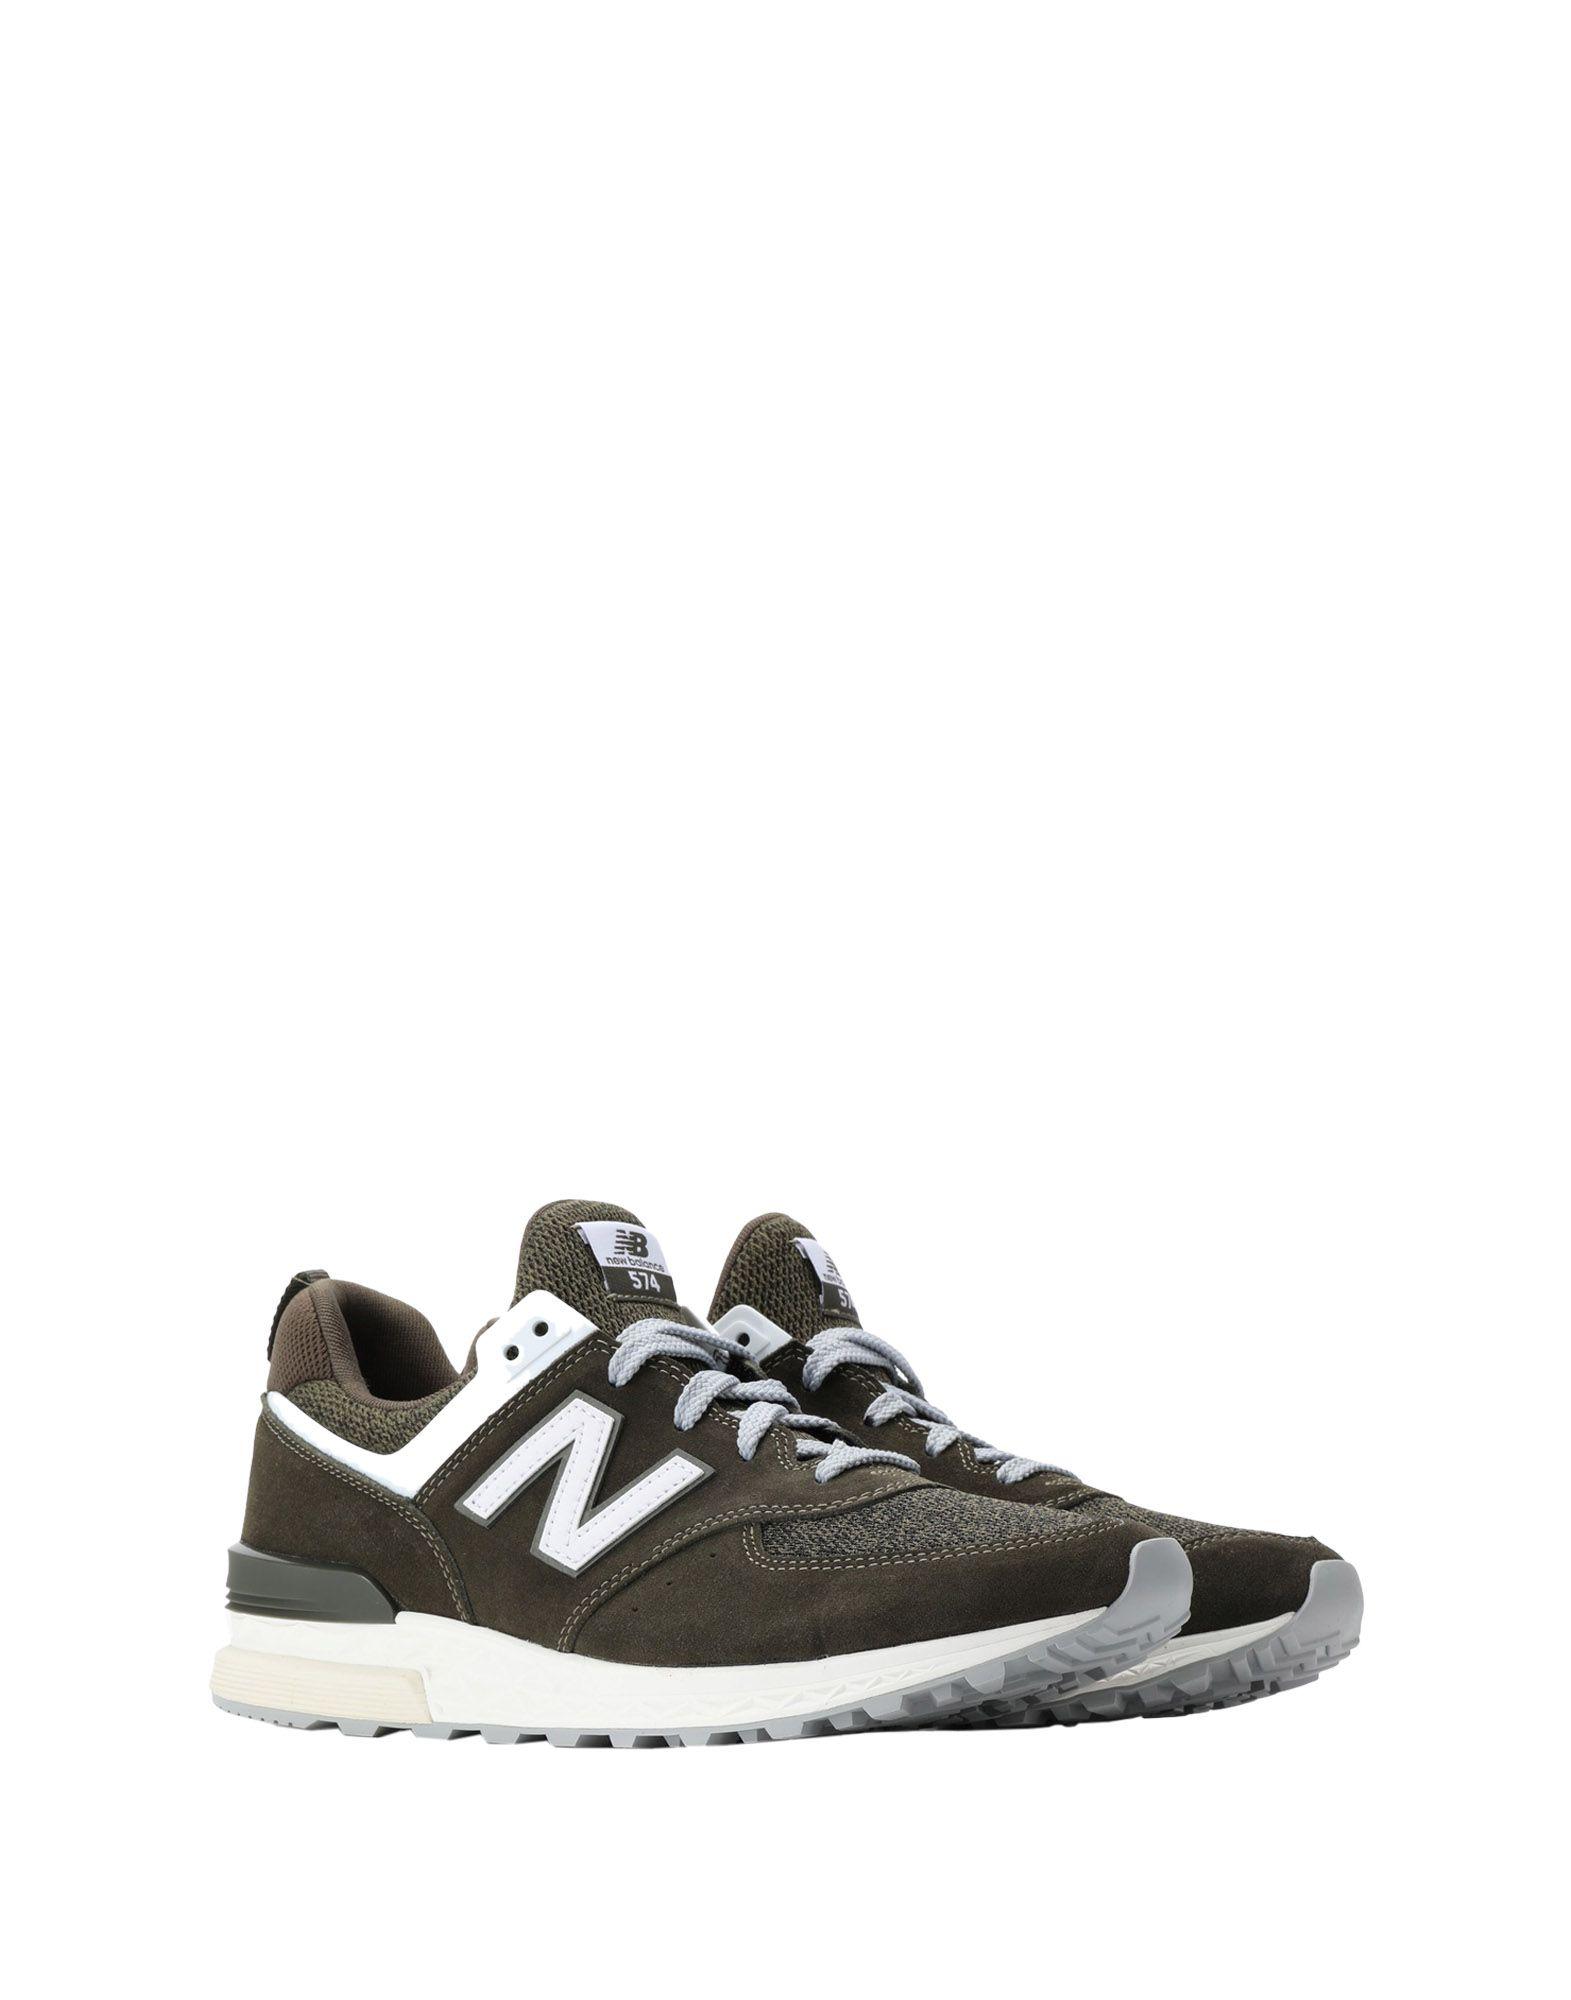 New Balance 574 574 574 Sport - Sneakers - Men New Balance Sneakers online on  Australia - 11341662IW 2bda27